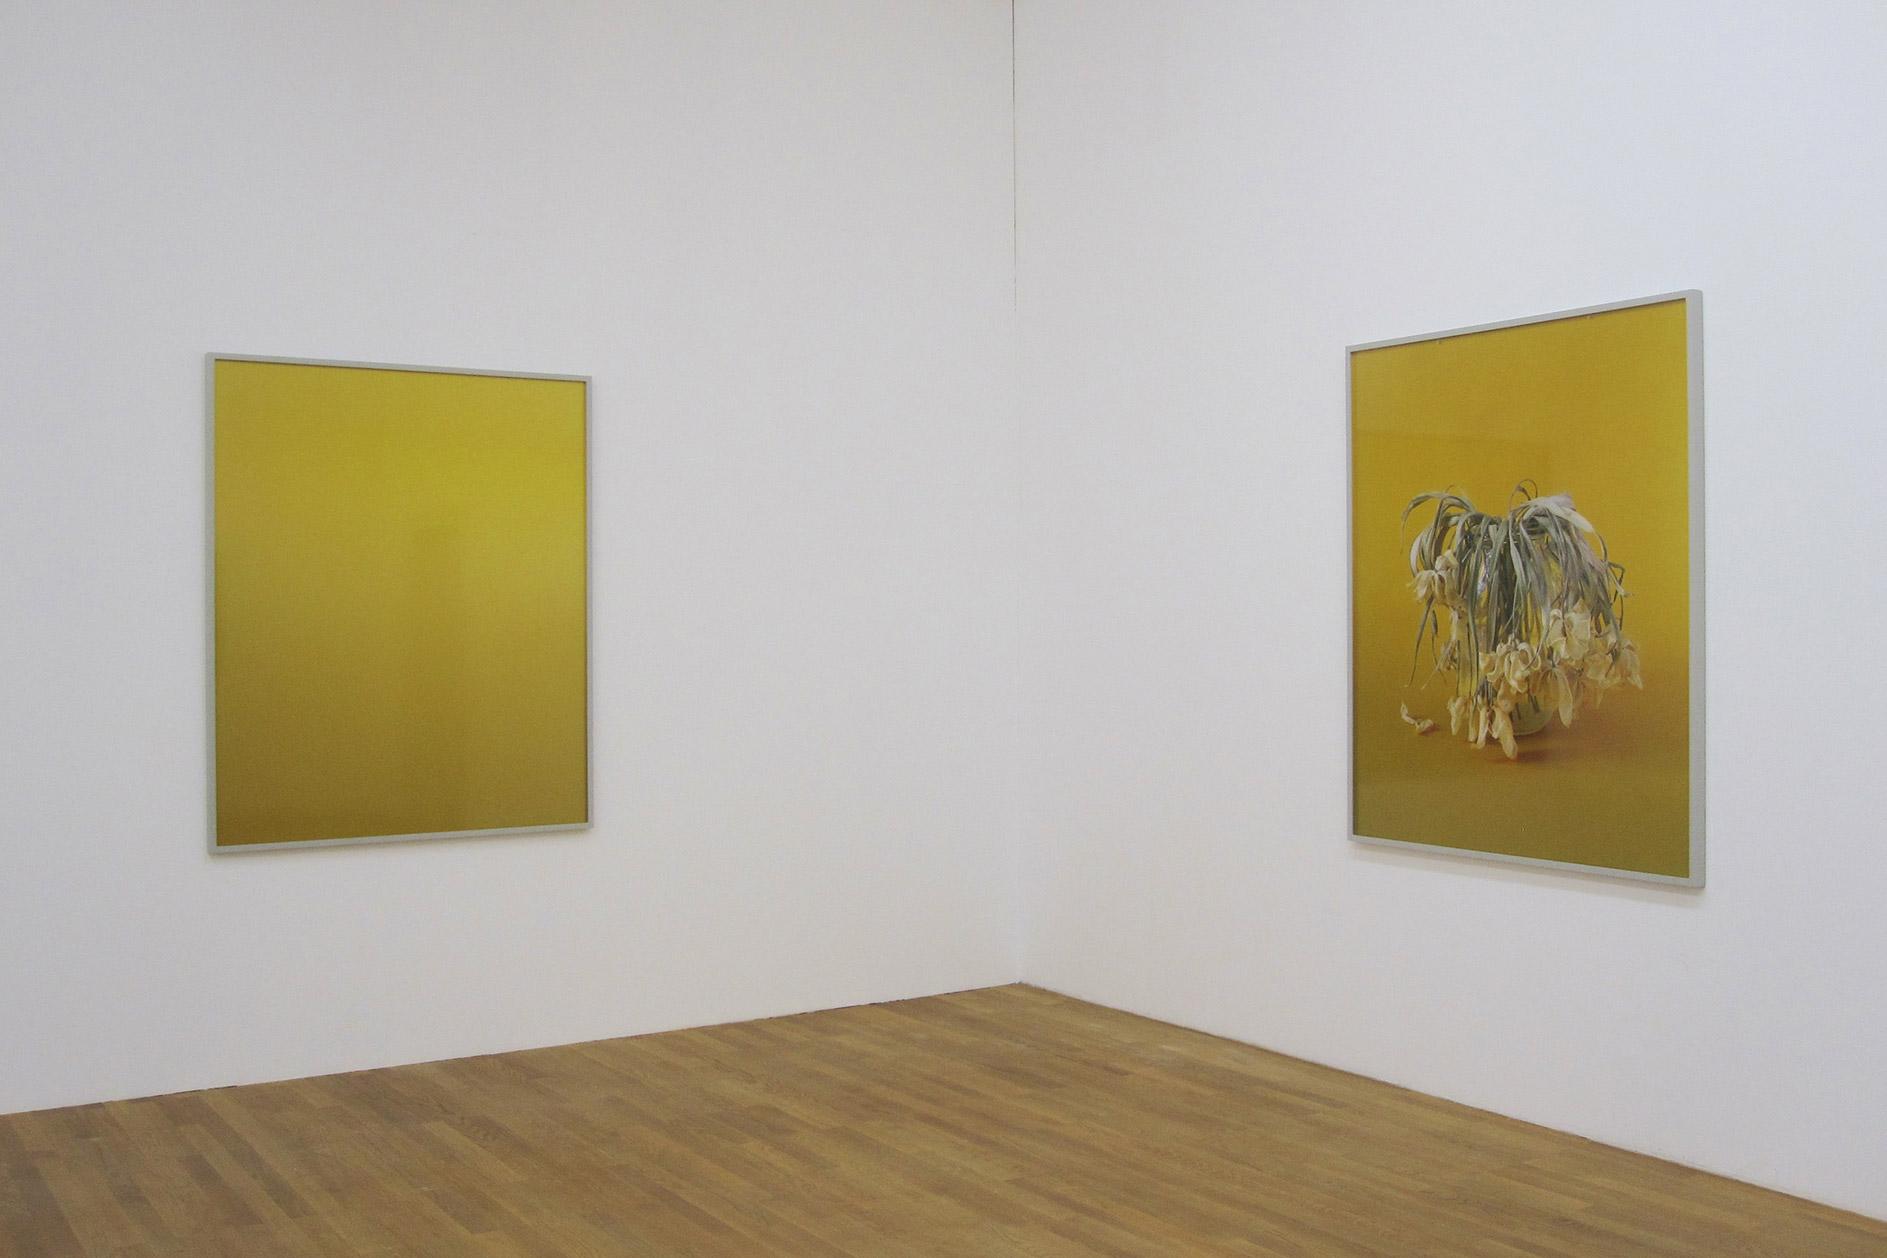 Susanne-Kriemann-Kunsthalle-Winterthur-2011.jpg